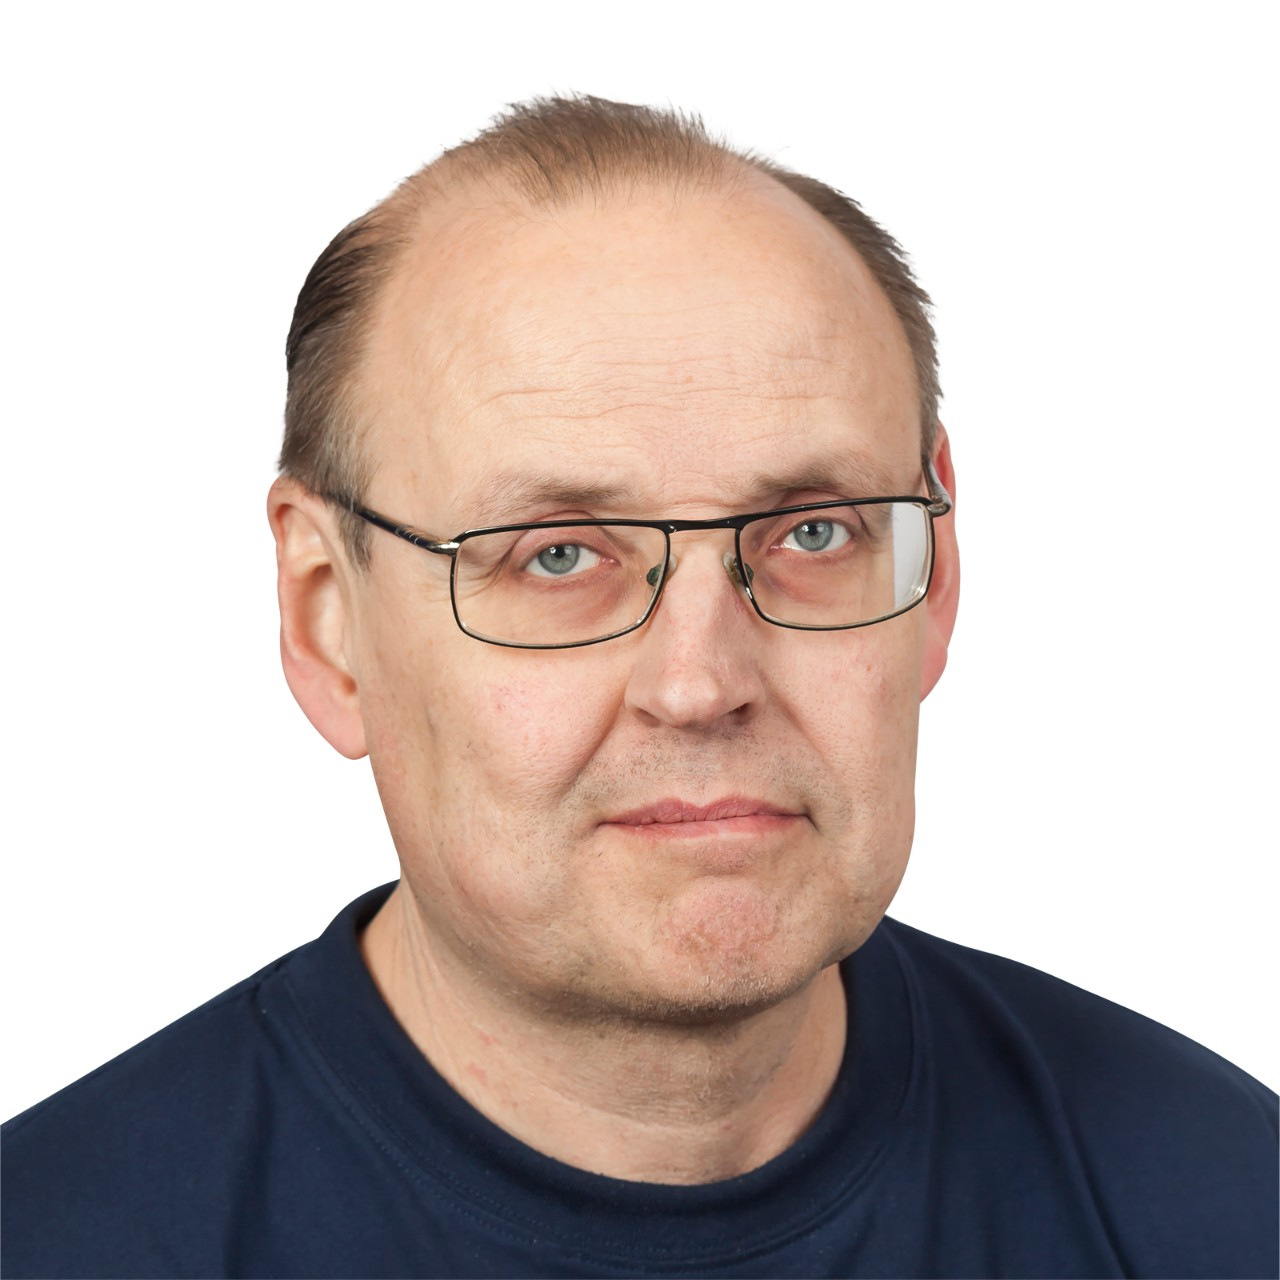 Johannes Berglund